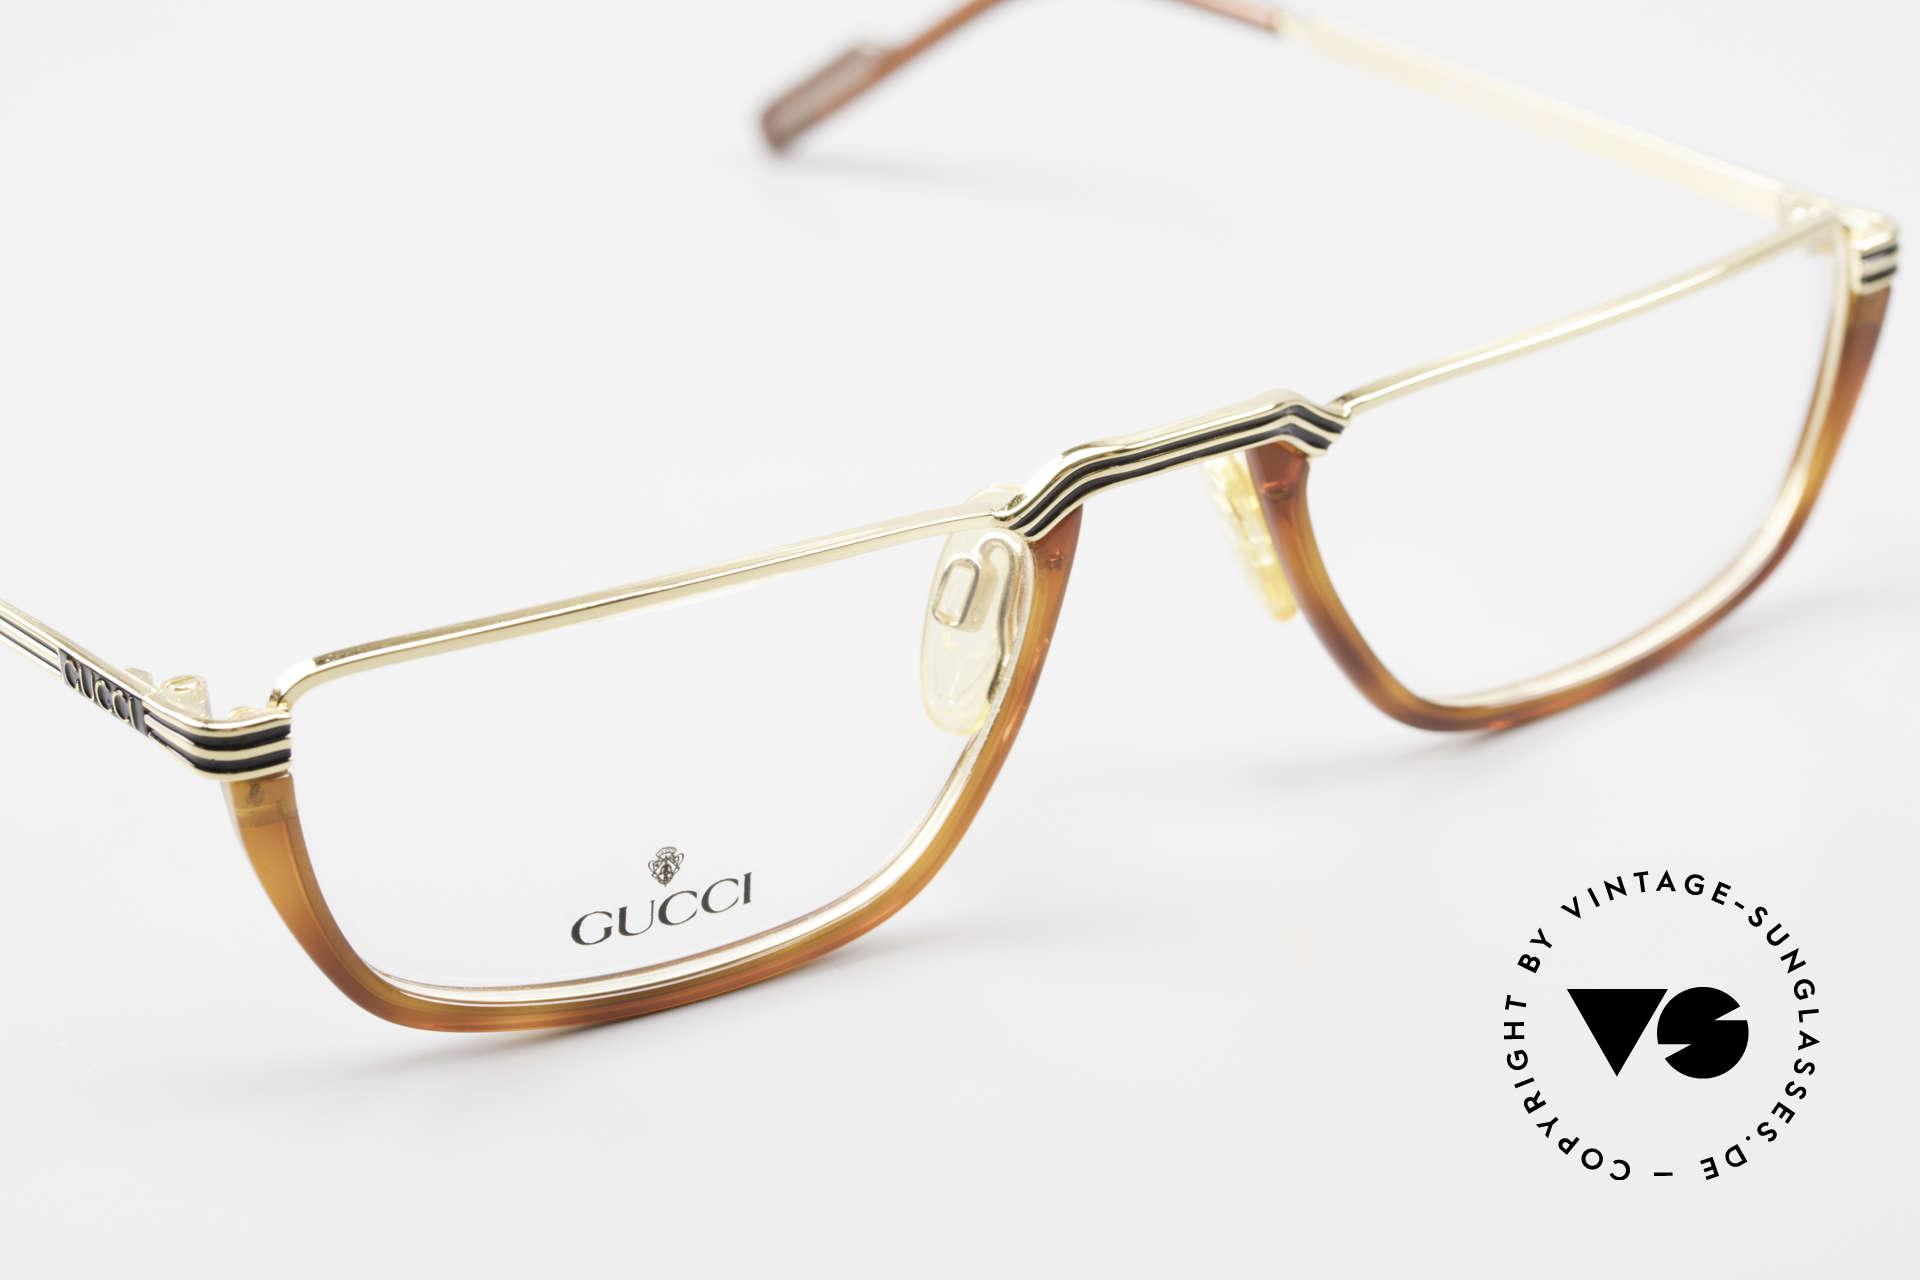 Gucci 1306 Designer Reading Eyeglasses, NO RETRO eyeglasses, but a 30 years old original, Made for Men